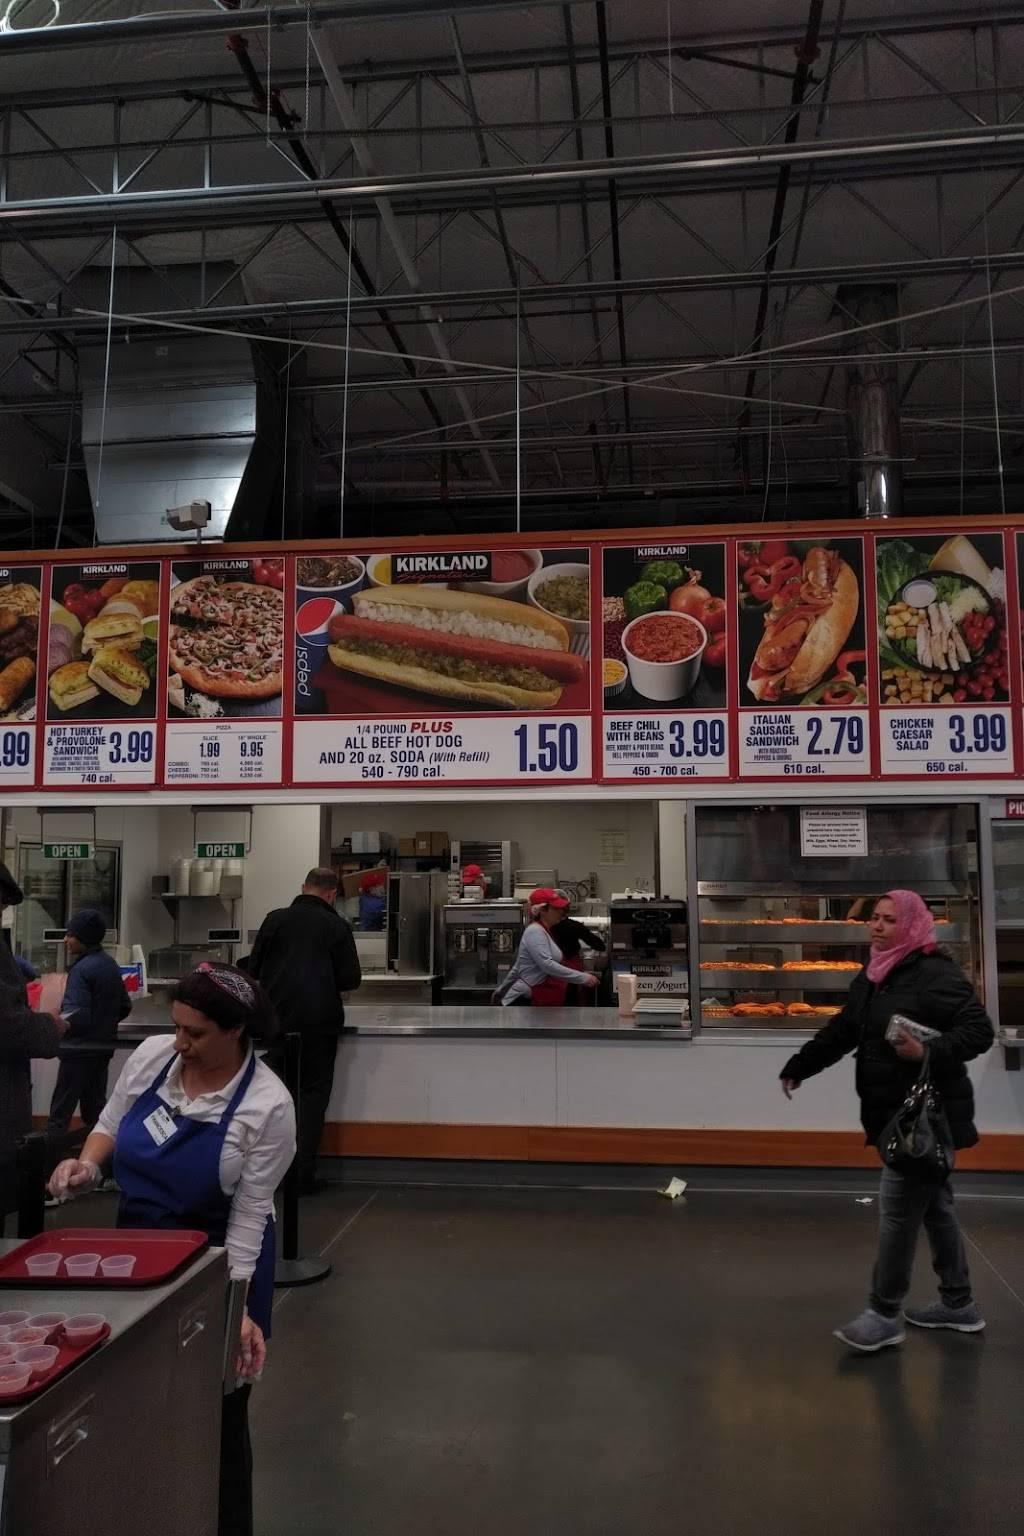 Costco Food Court   meal takeaway   2 Teterboro Landing Drive, Teterboro, NJ 07608, USA